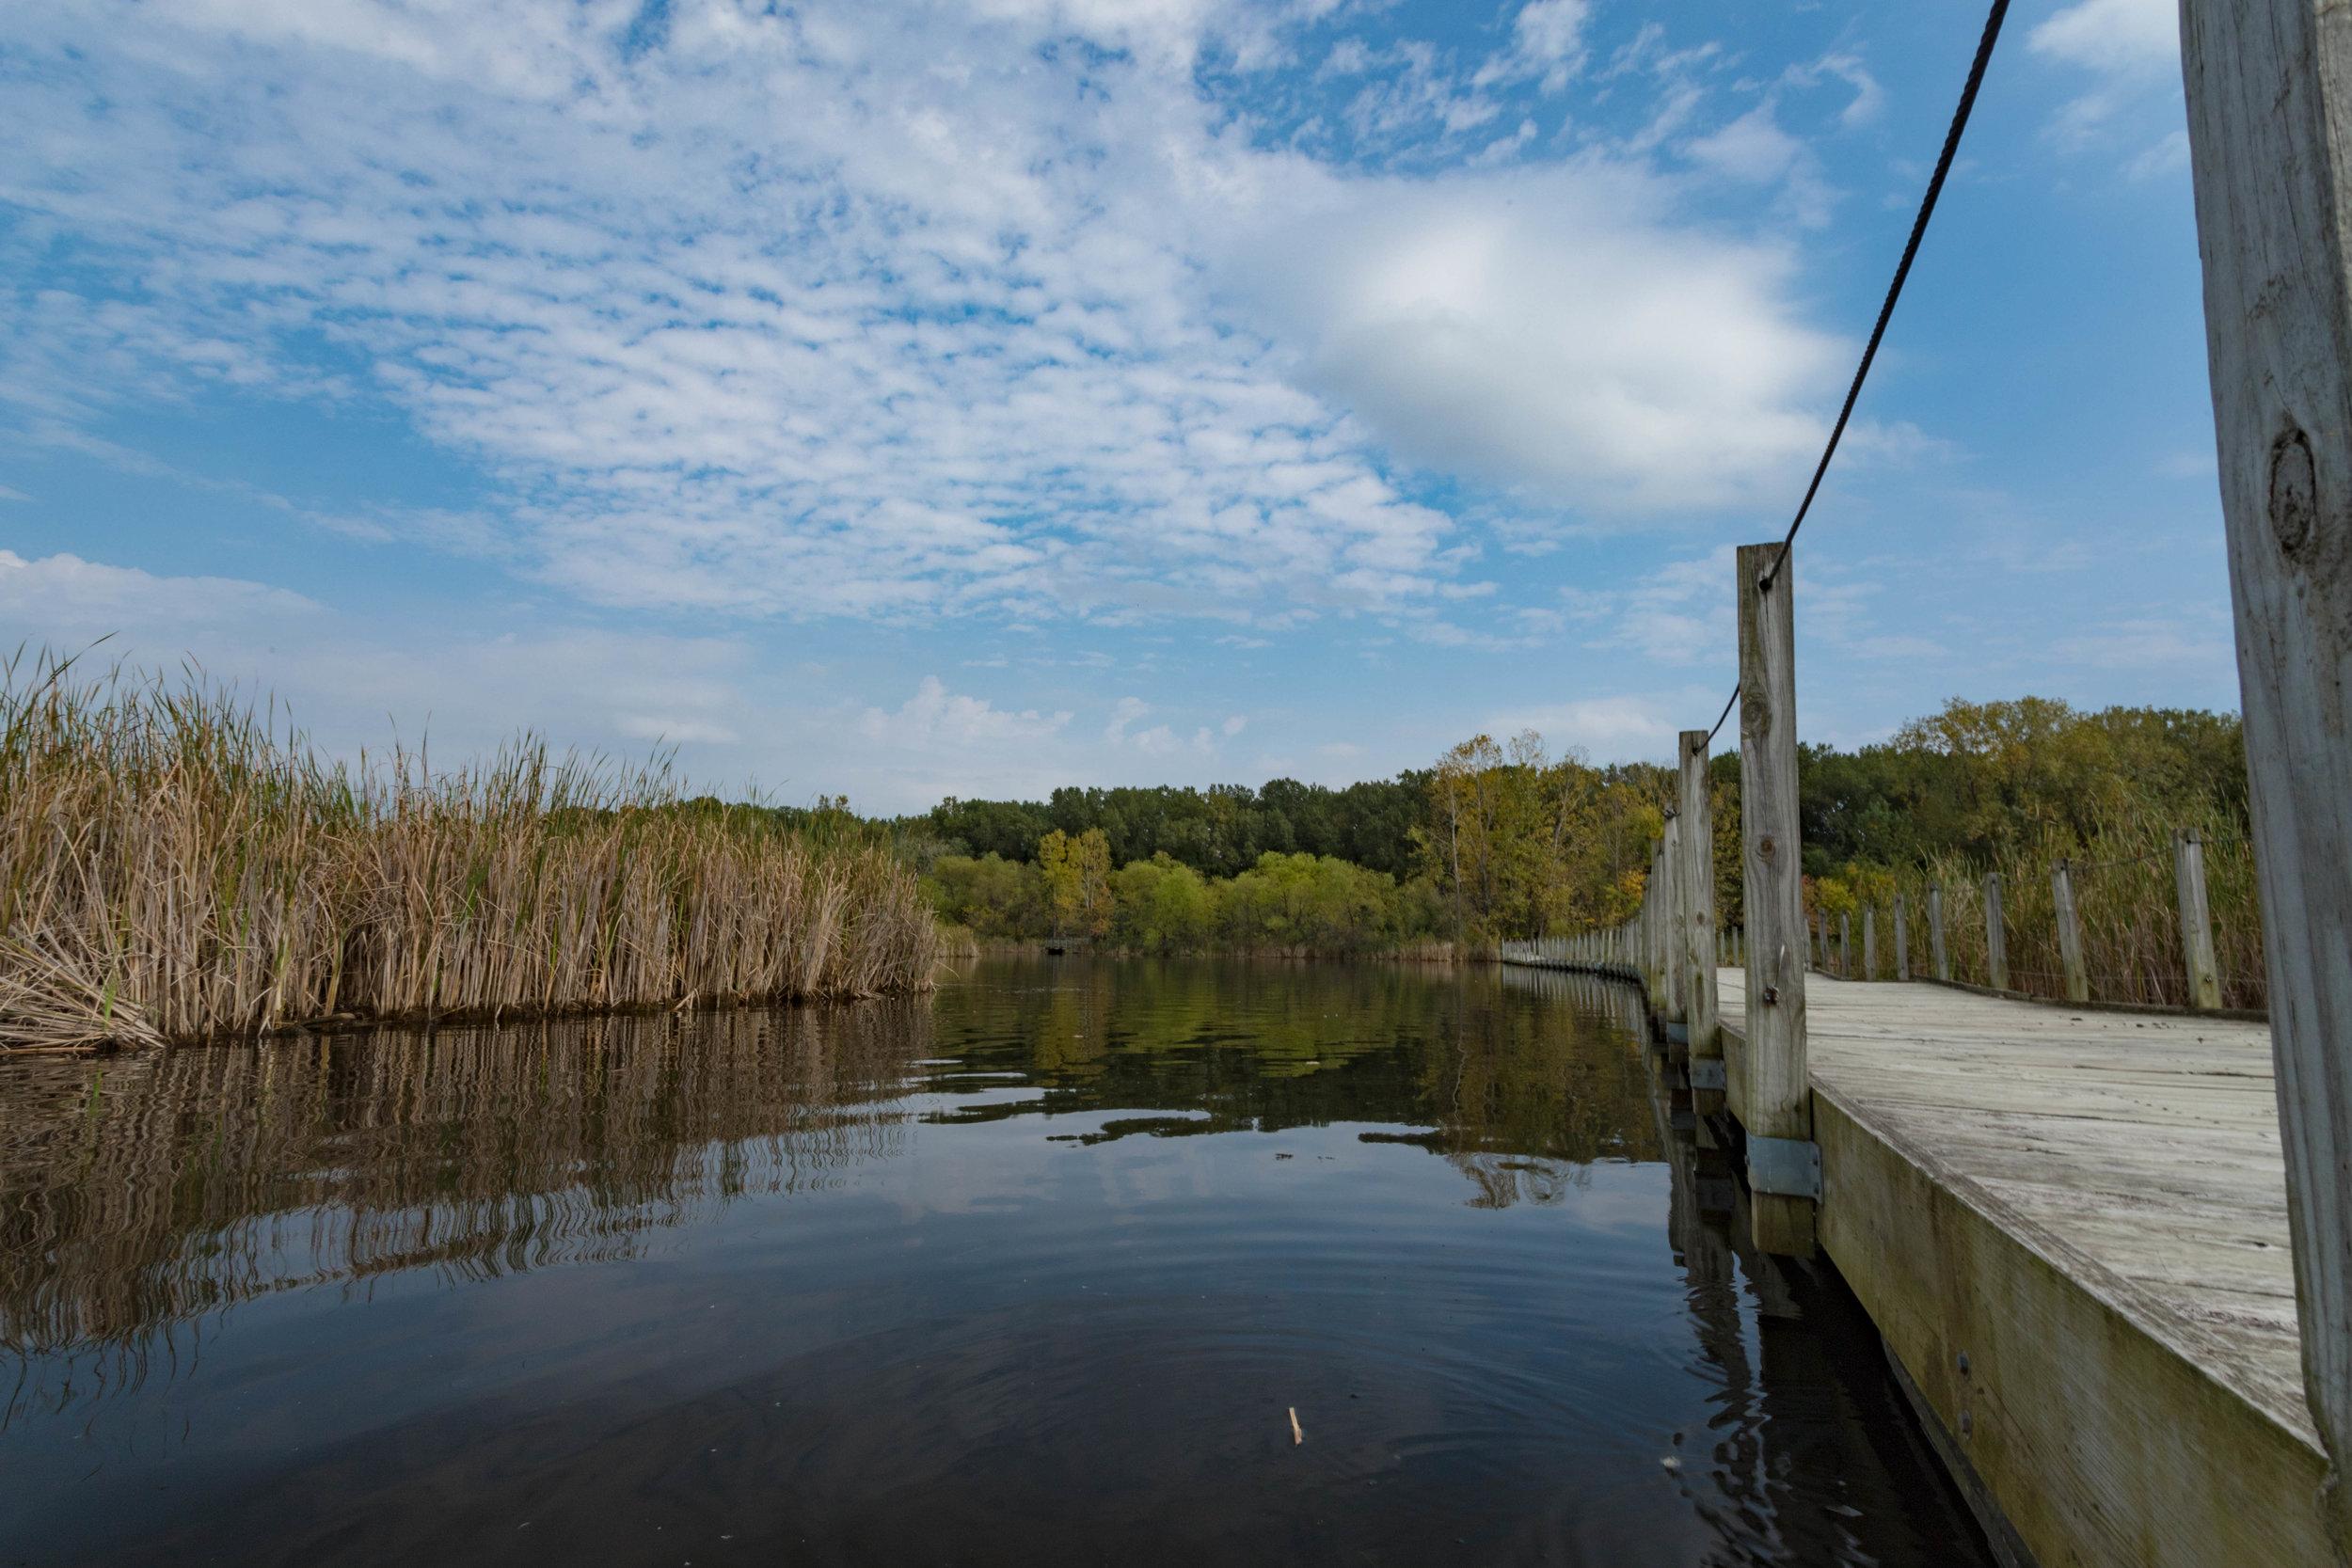 september 19, 2017  wood lake nature center - richfield, minnesota